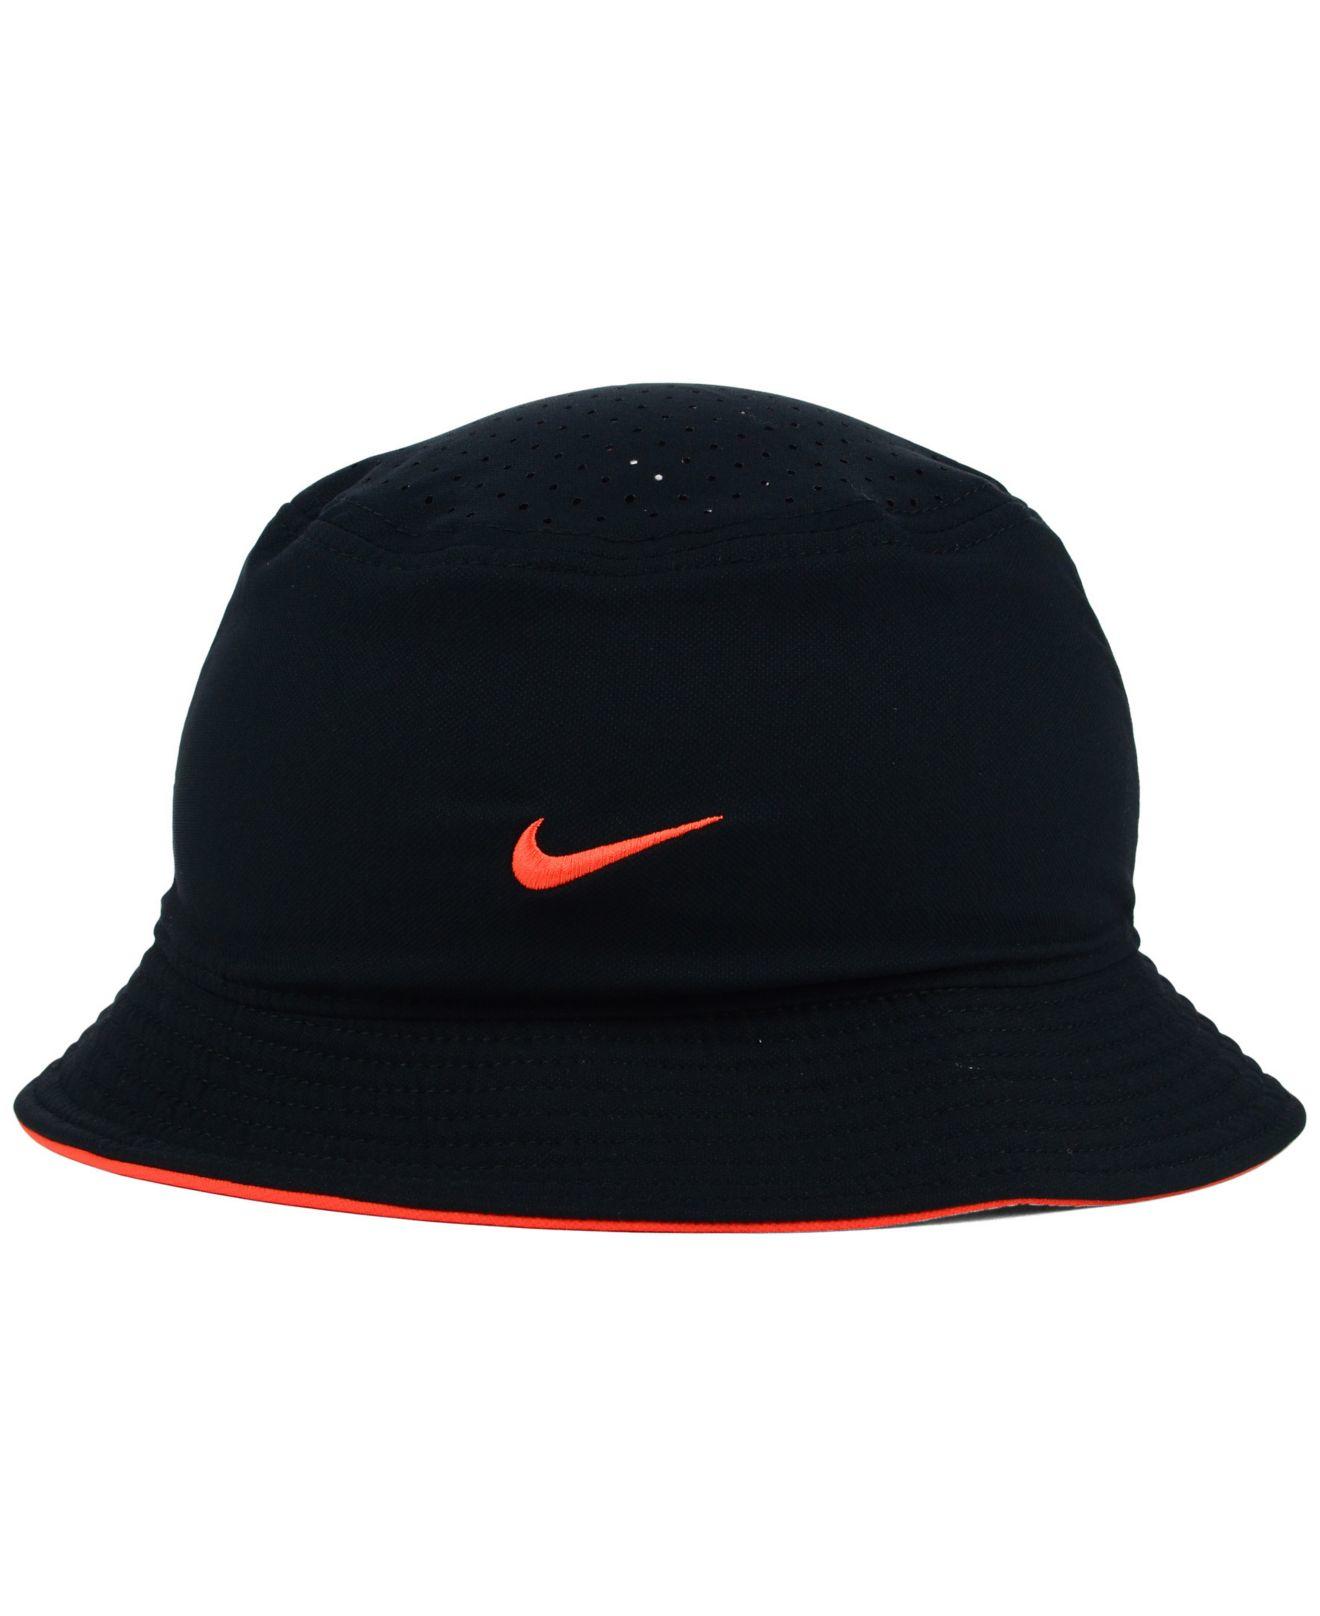 ... switzerland lyst nike san francisco giants vapor dri fit bucket hat in  black 81002 4dfb8 ... 4f2d9f12042